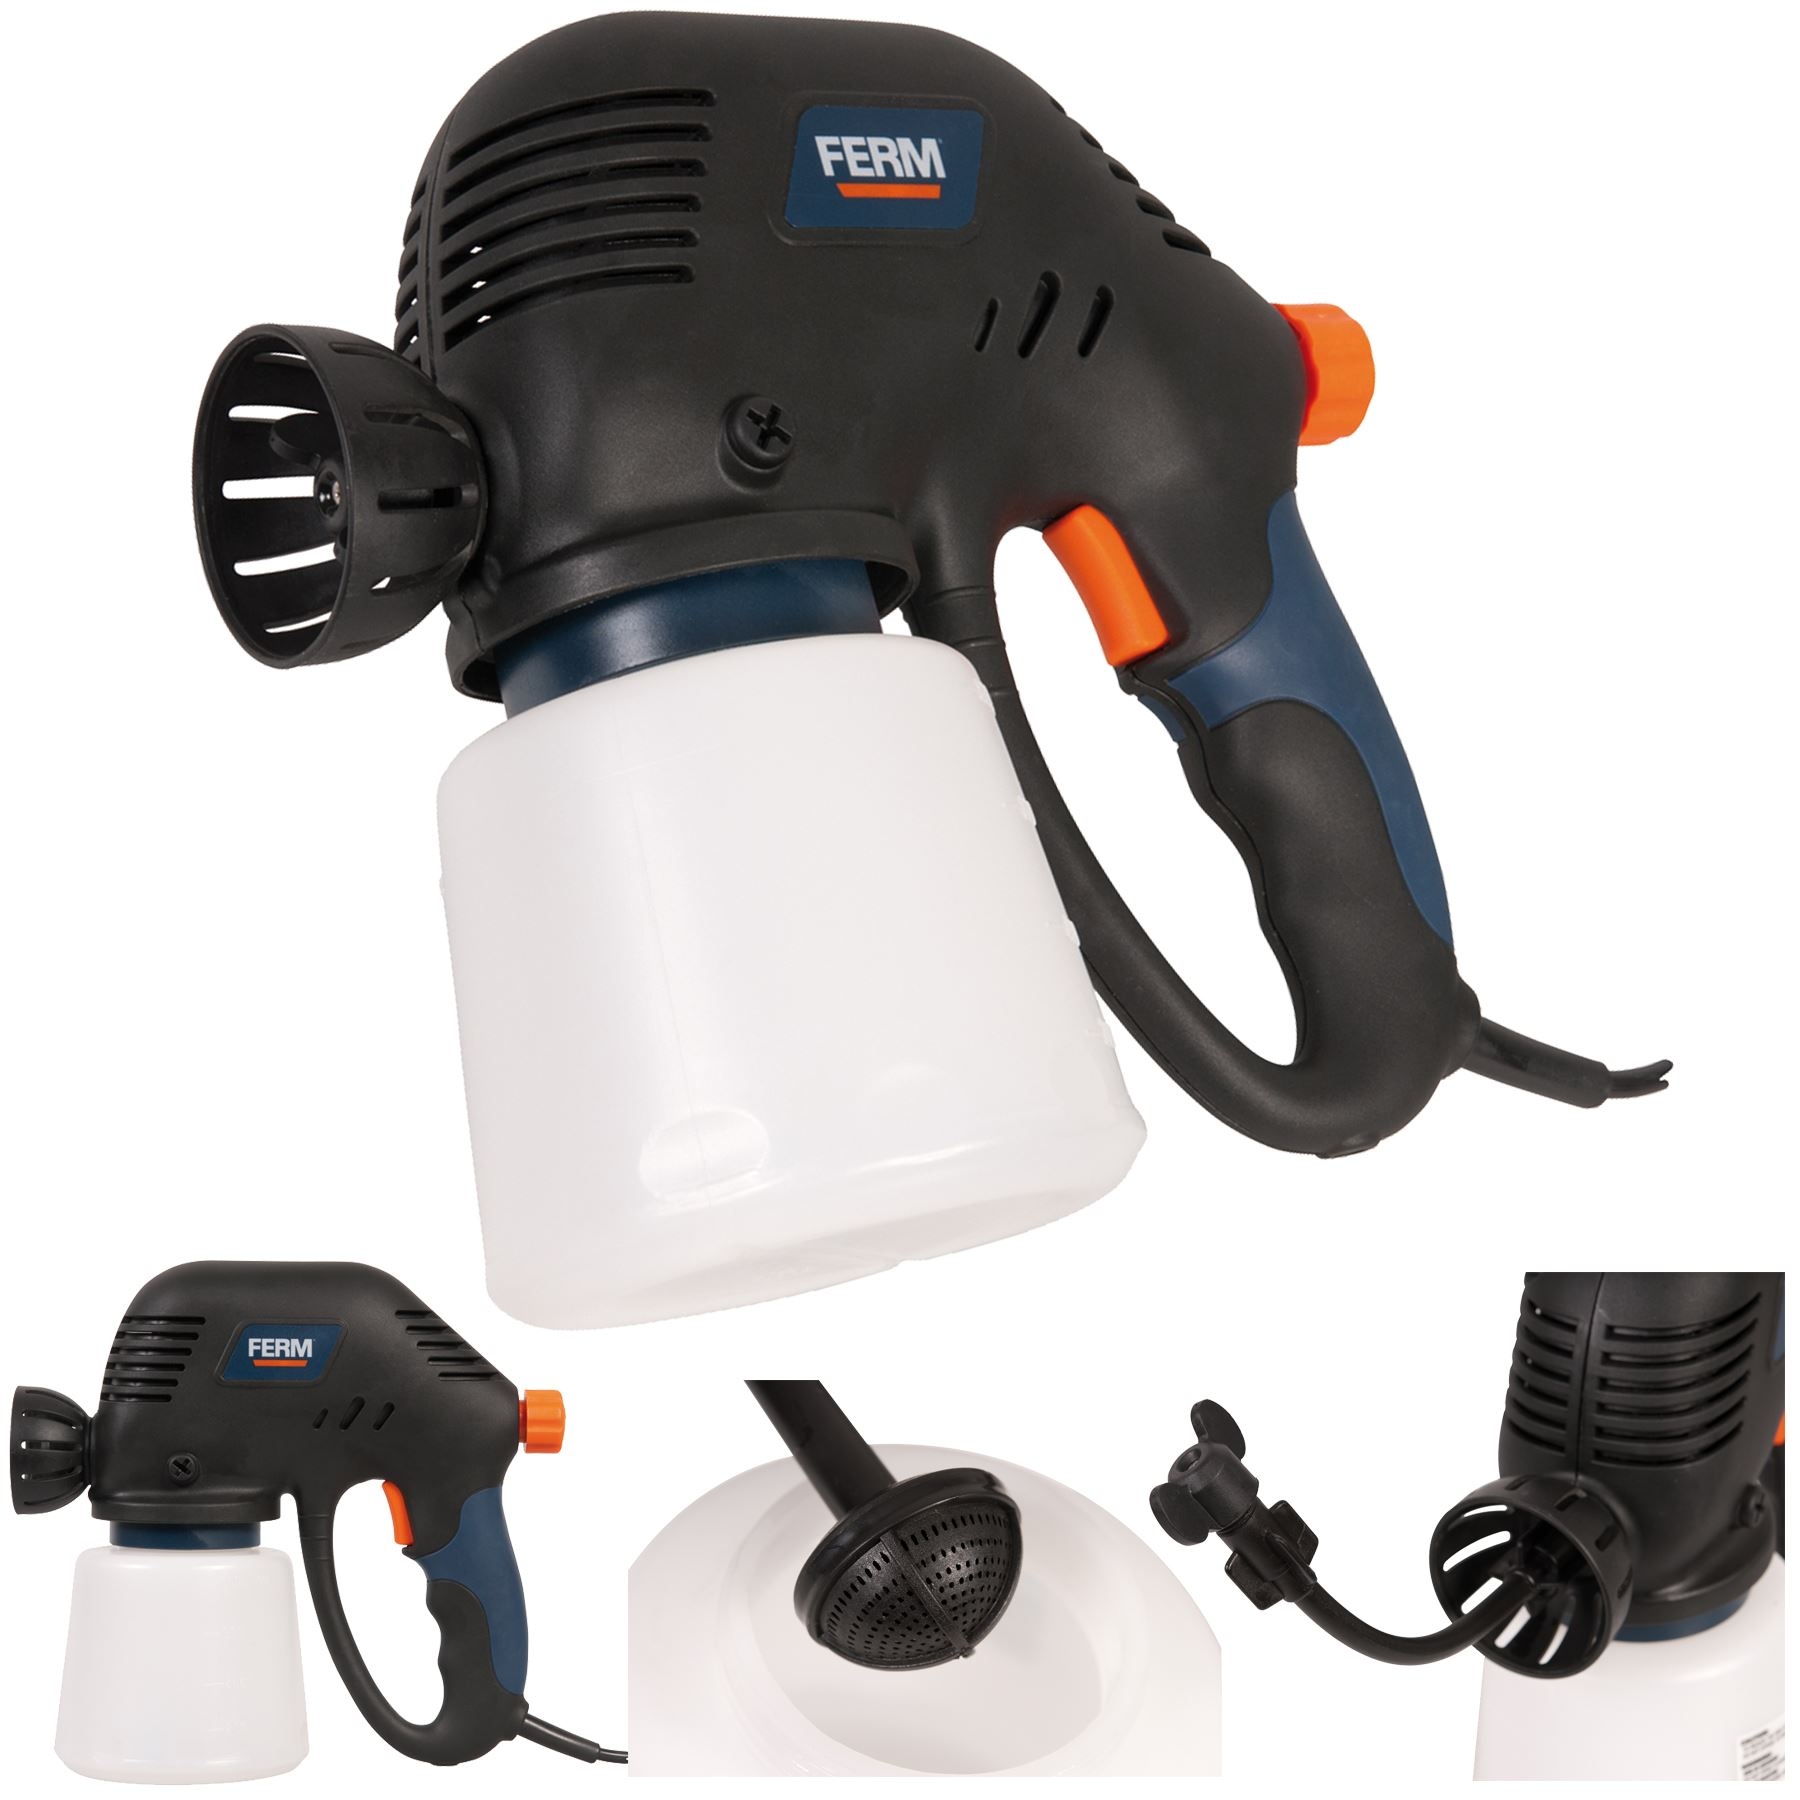 electric paint airless spraygun sprayer spray gun fence. Black Bedroom Furniture Sets. Home Design Ideas